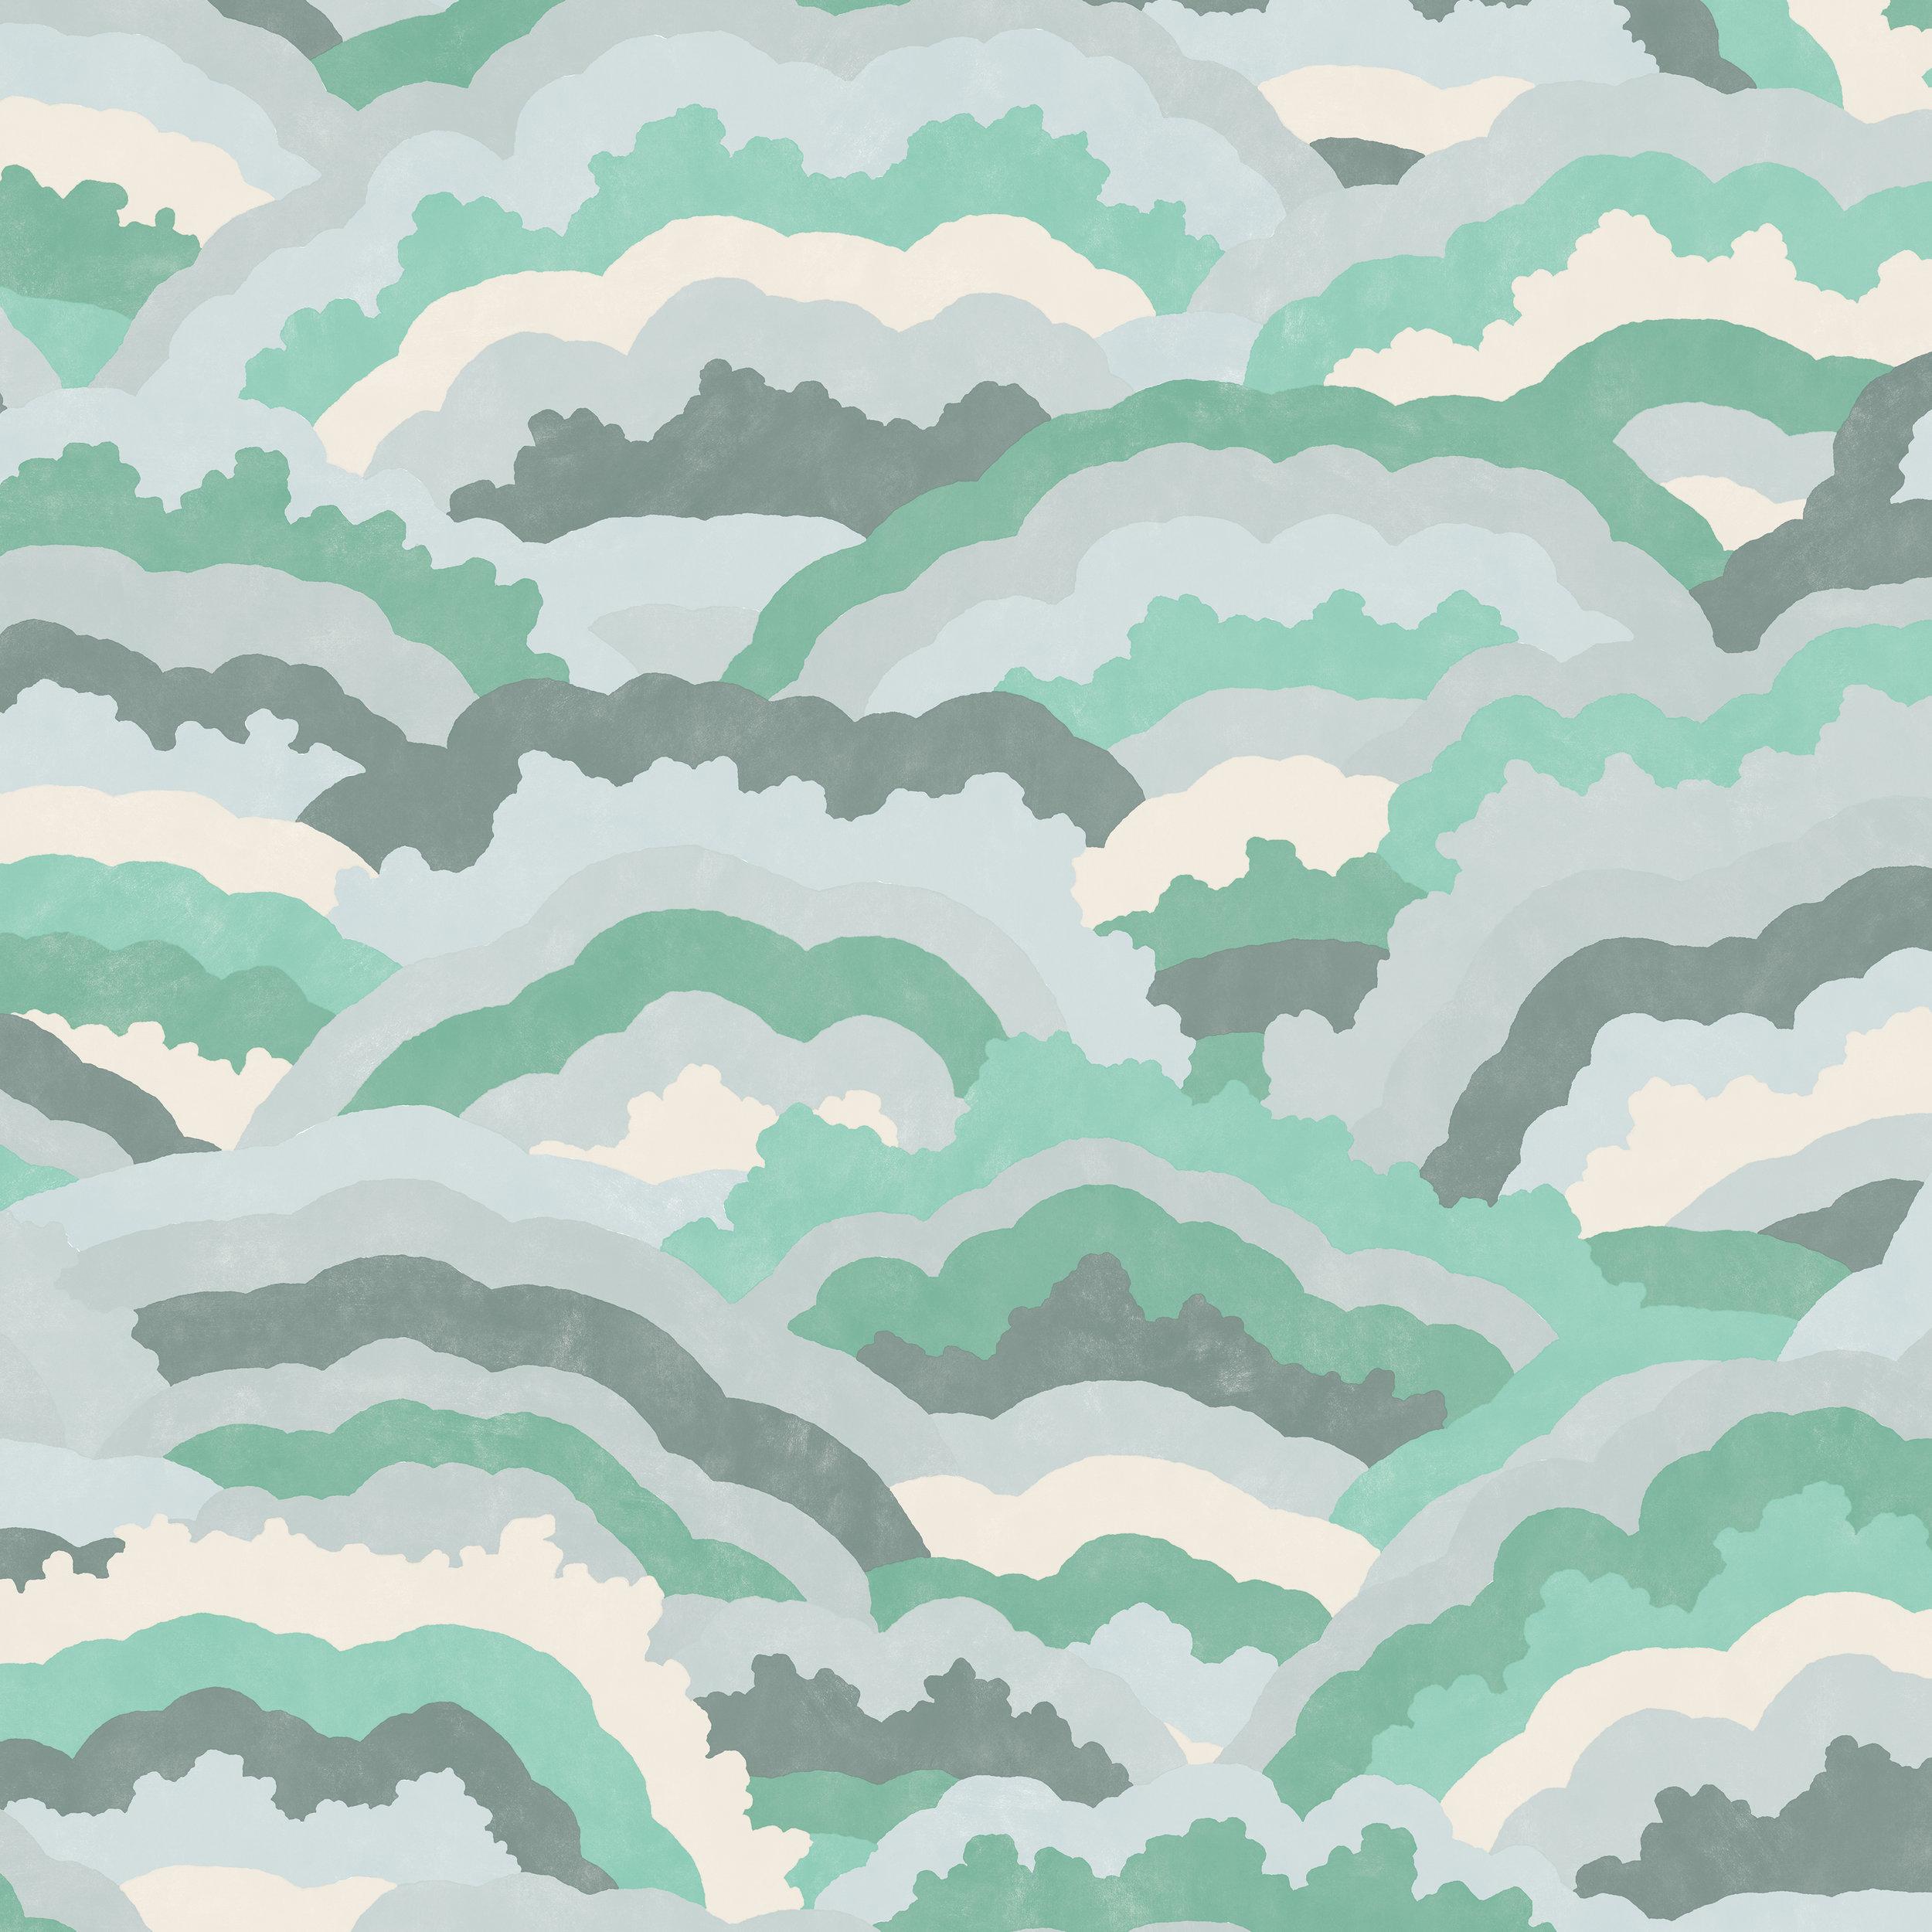 Dreamhouse_Colorway3_detail_WEB.jpg